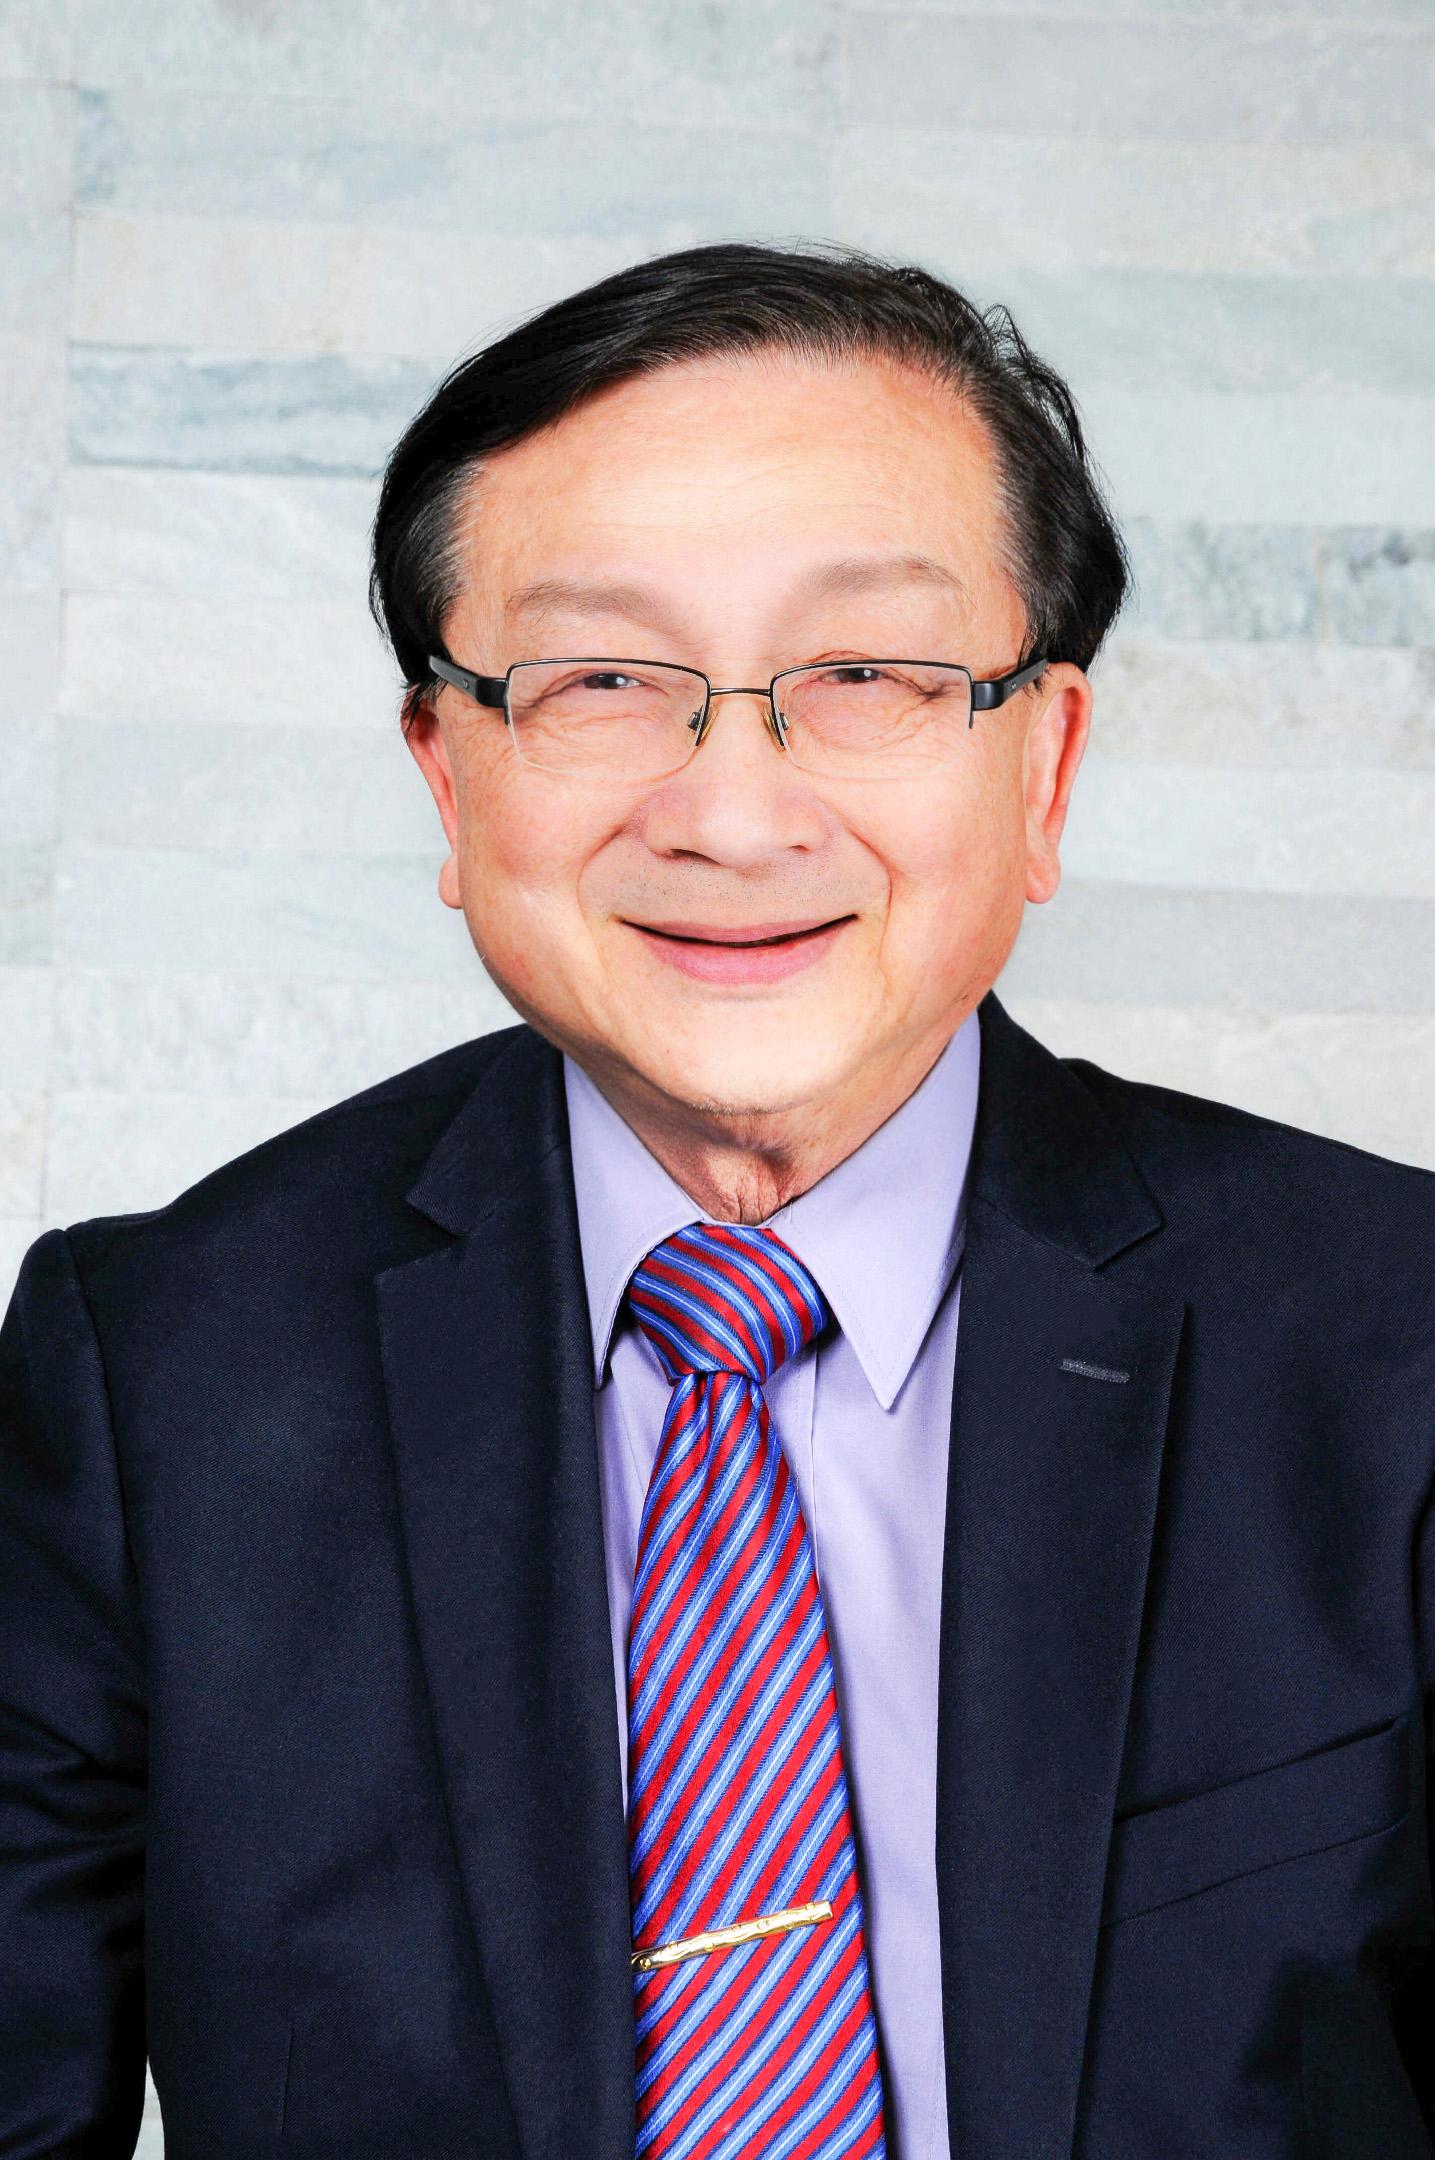 President & CEO - Dr. George Liu